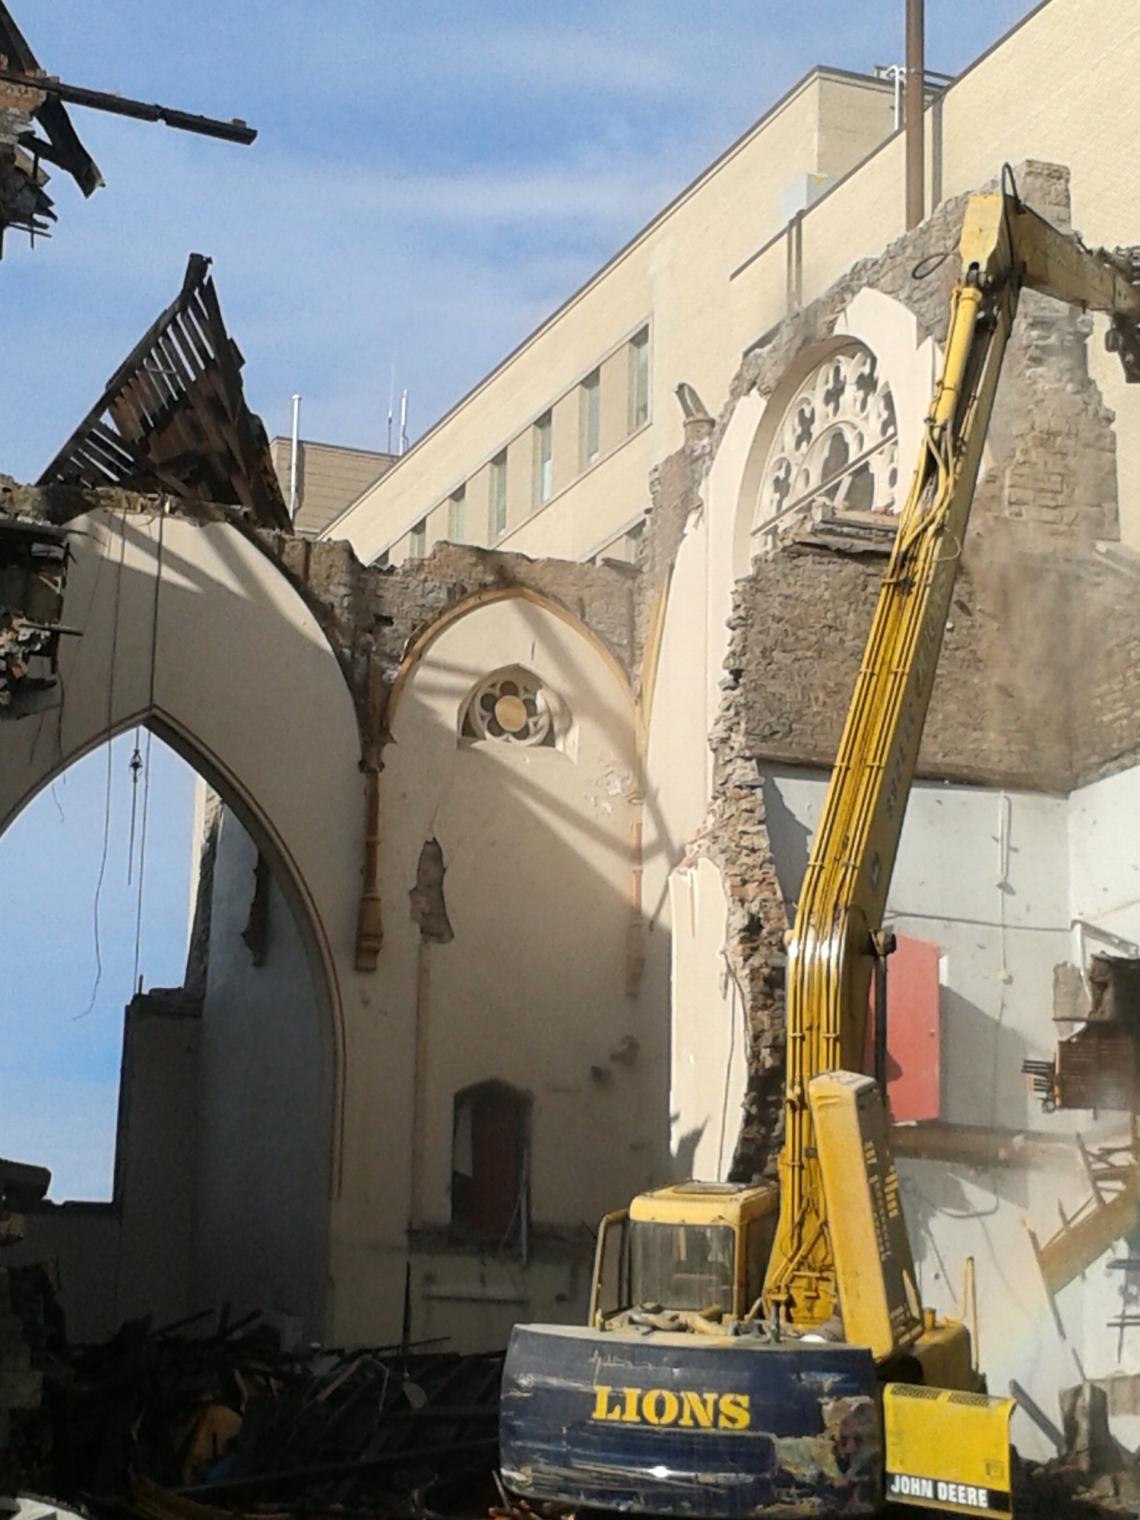 James Street Baptist Church Partial Demolition on June 6, 2014